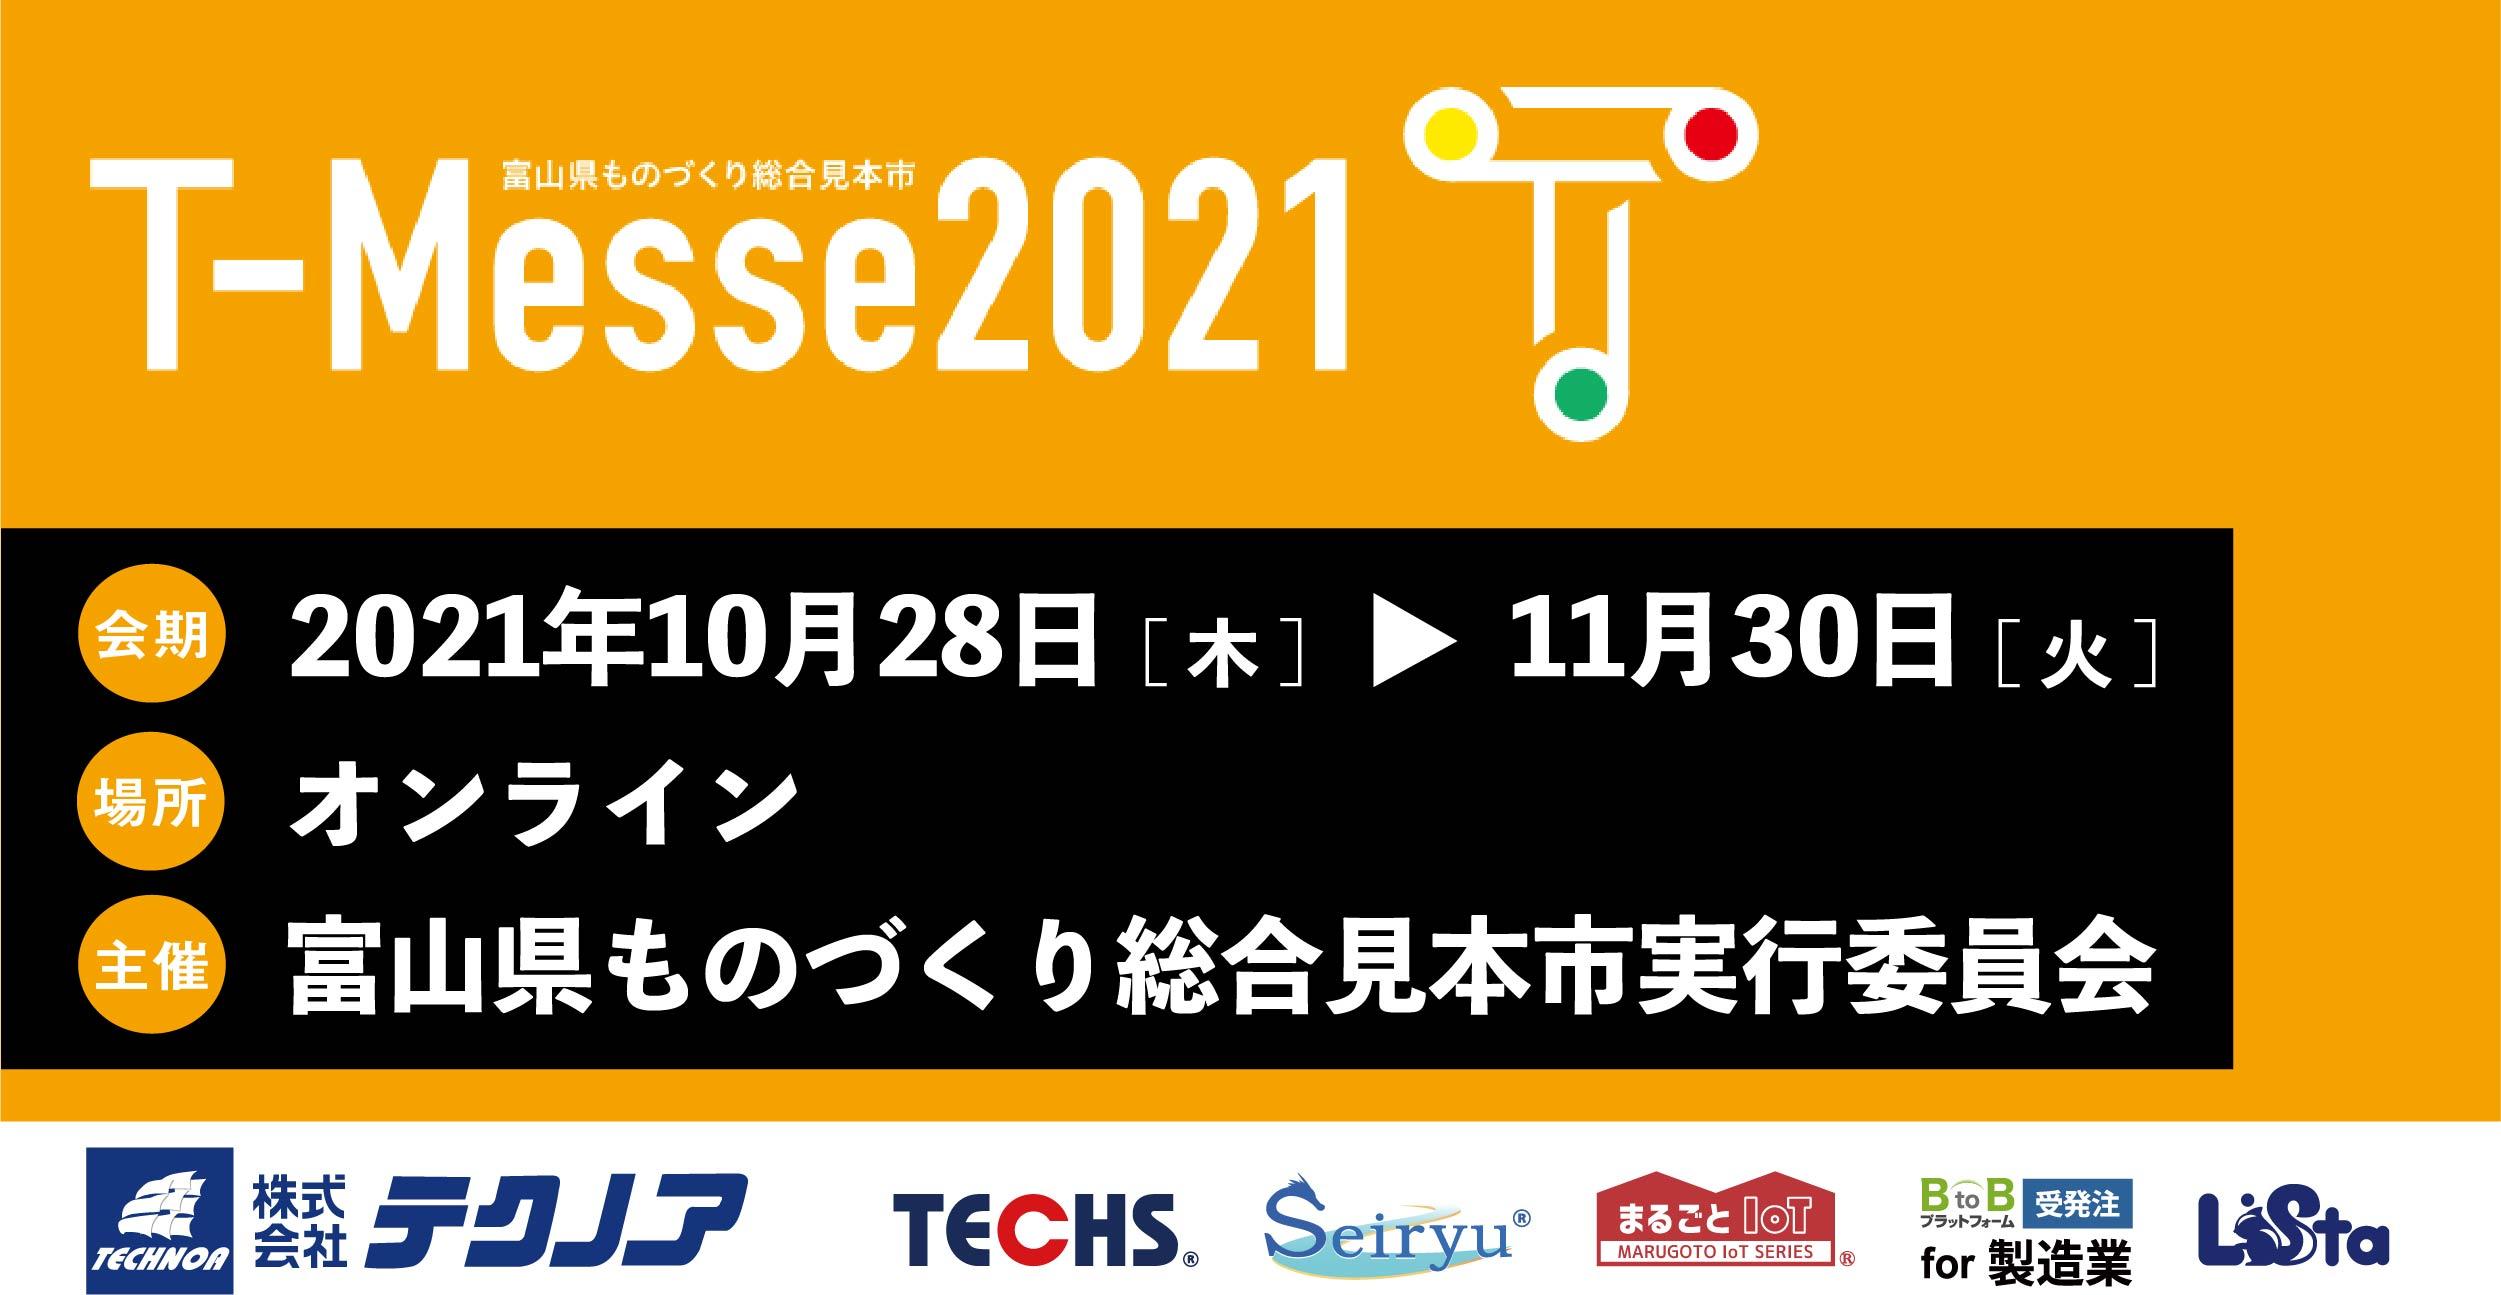 T-Messe2021 富山県ものづくり総合見本市